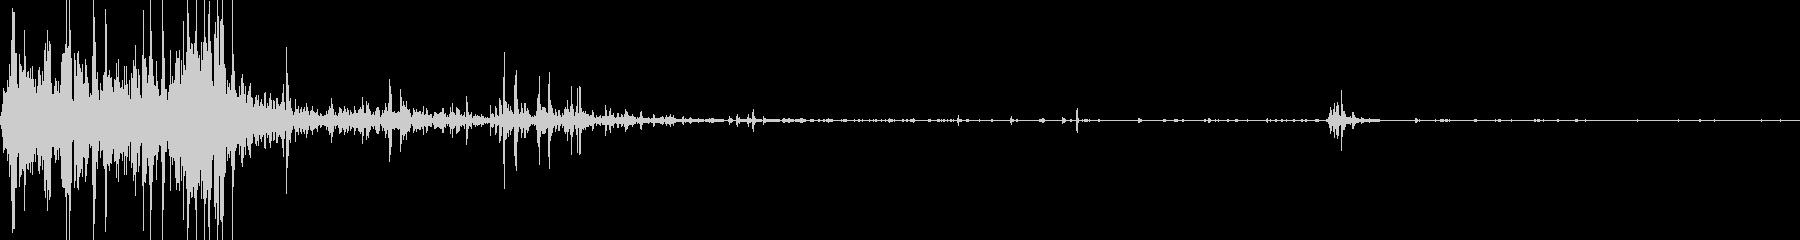 【YouTube】【物音】ジャリッ・・・の未再生の波形